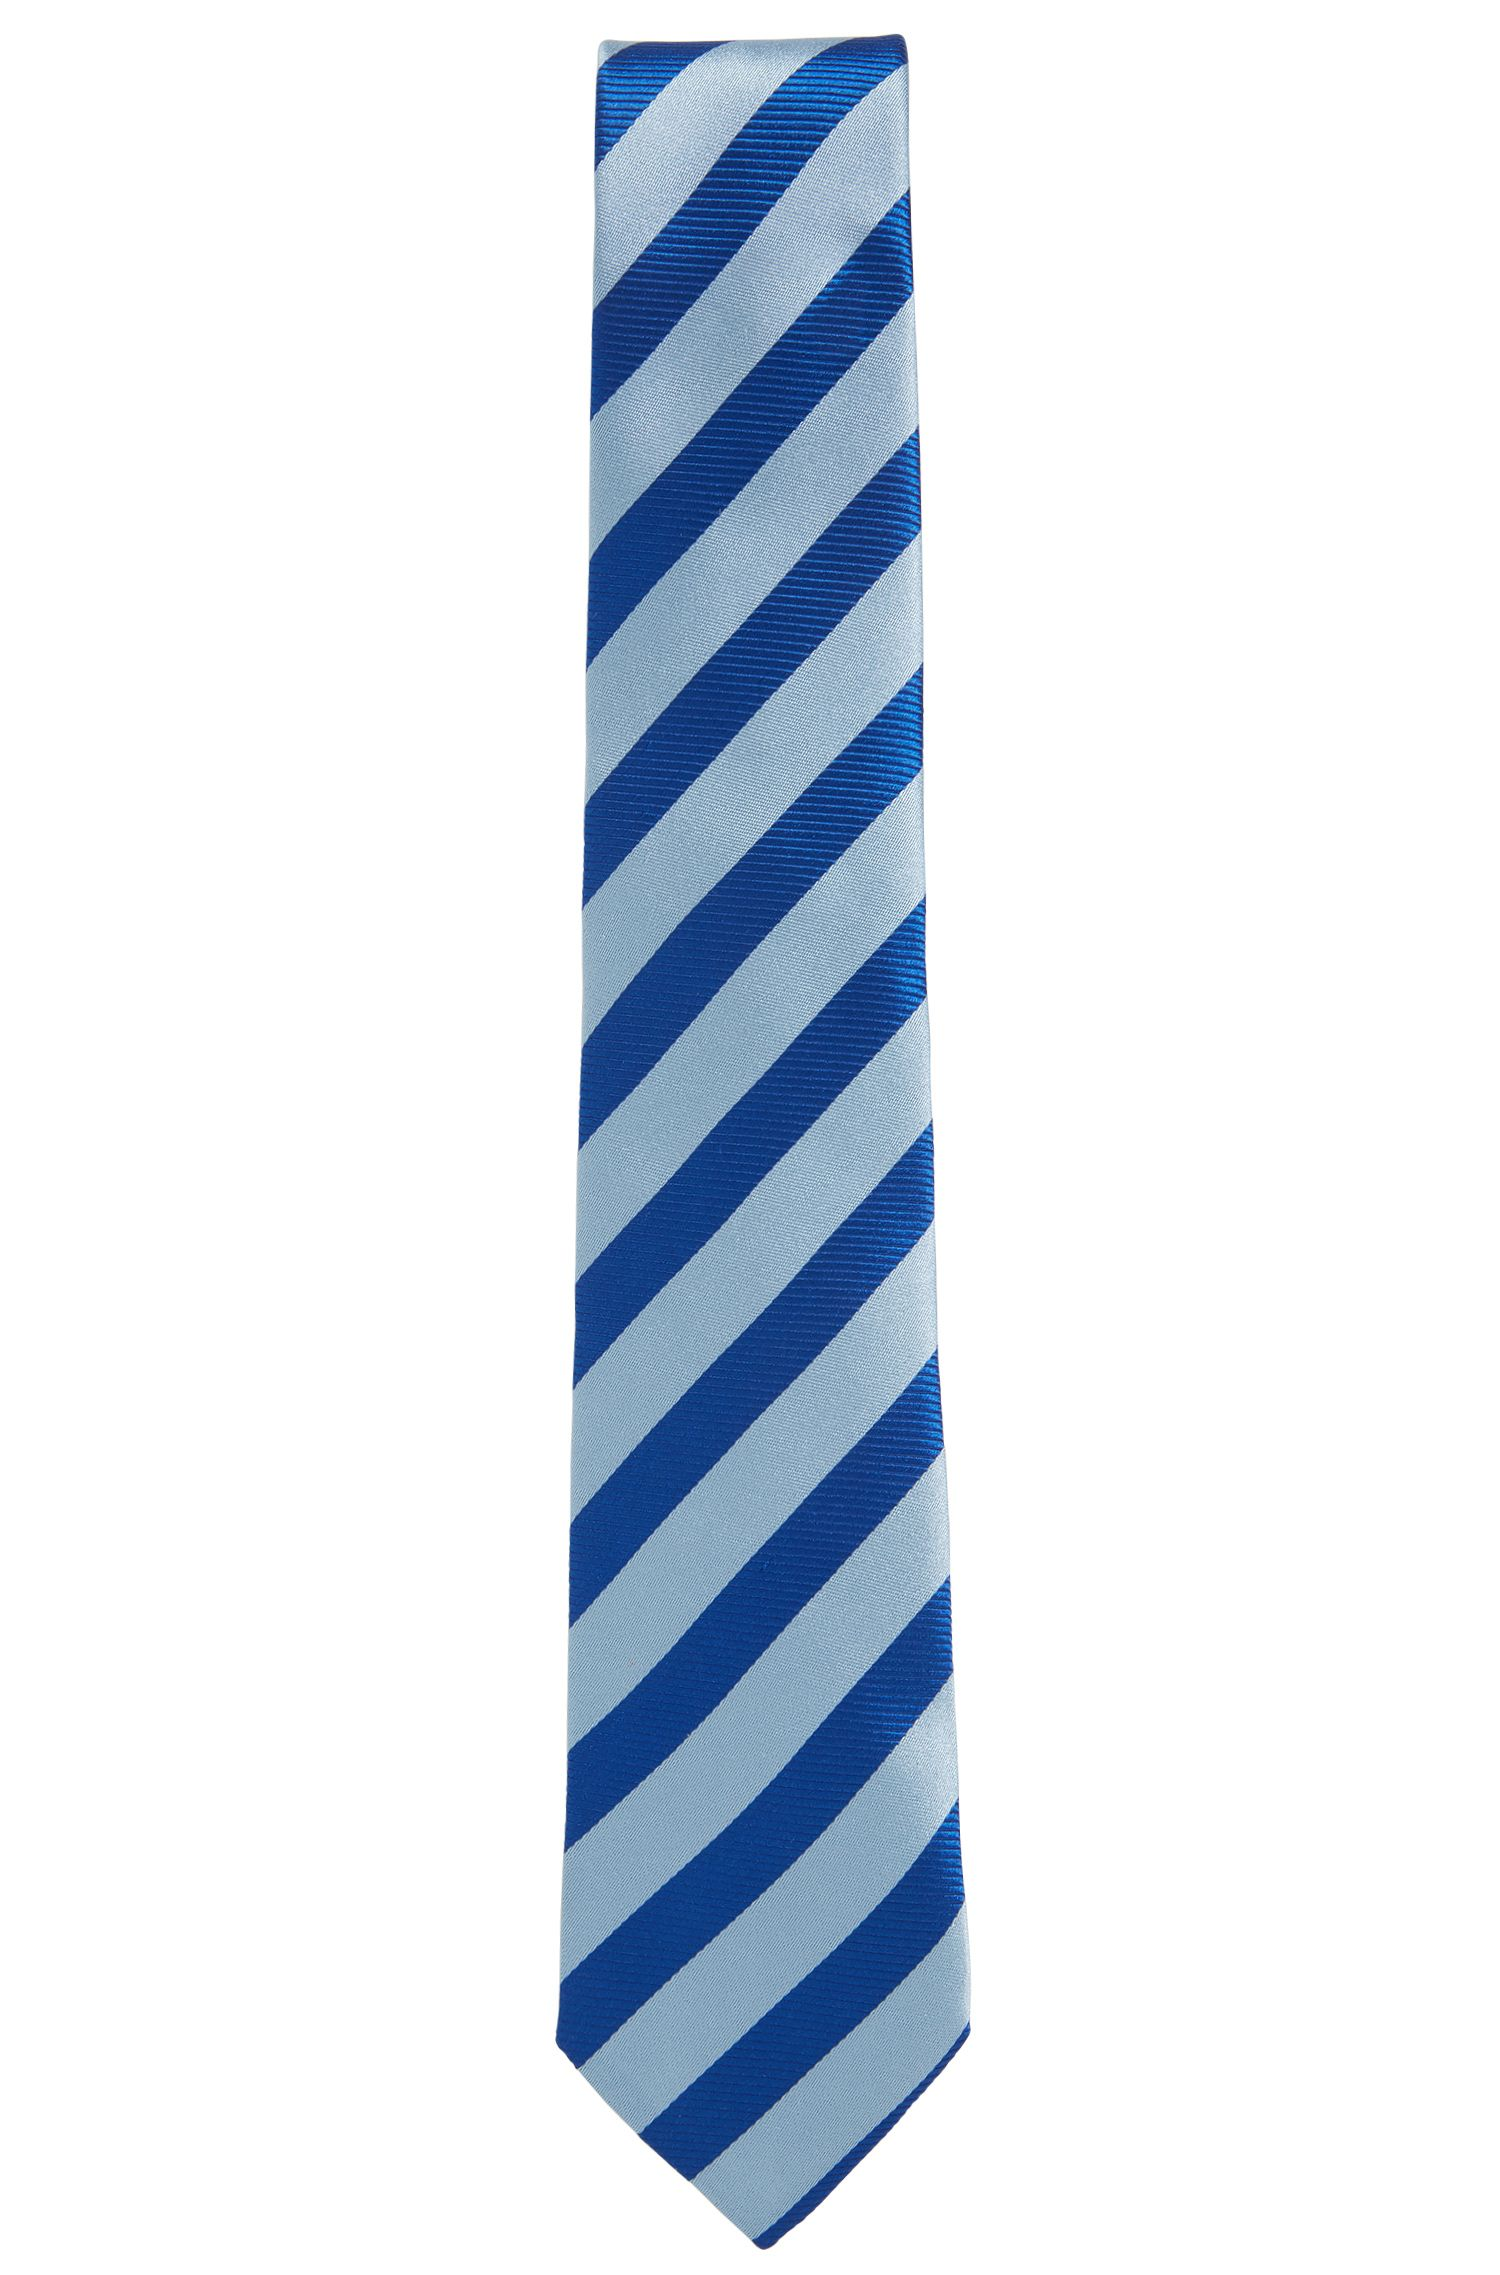 BOSS Tailored Italian Silk Jacquard Tie, Blue